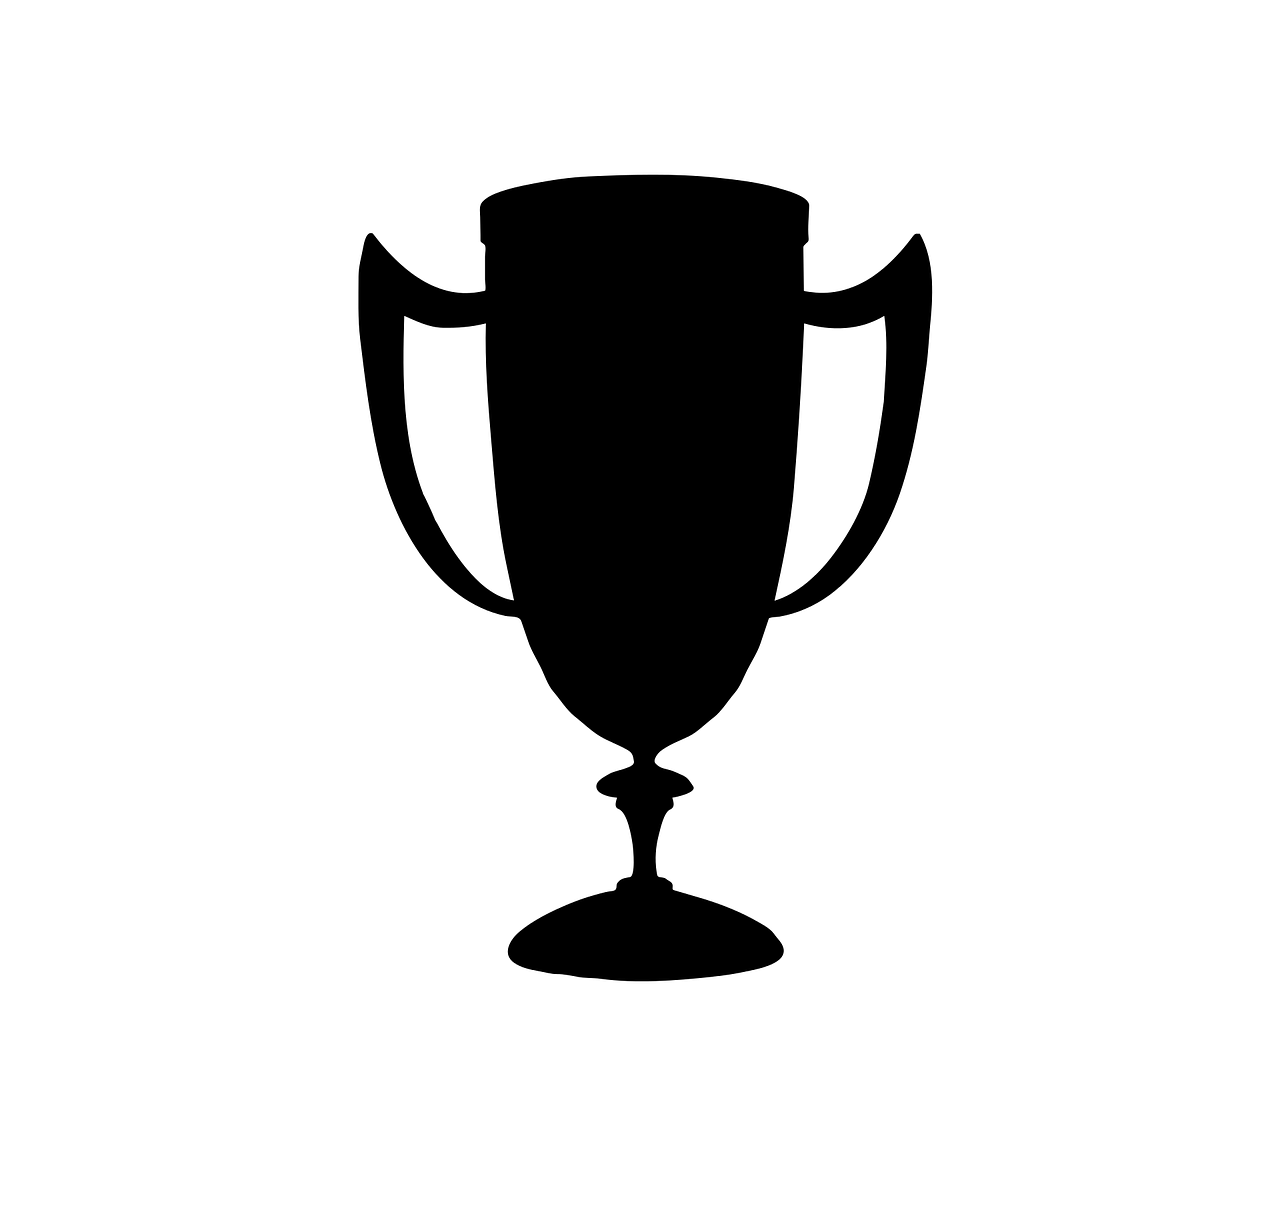 trophy-2707775_1280